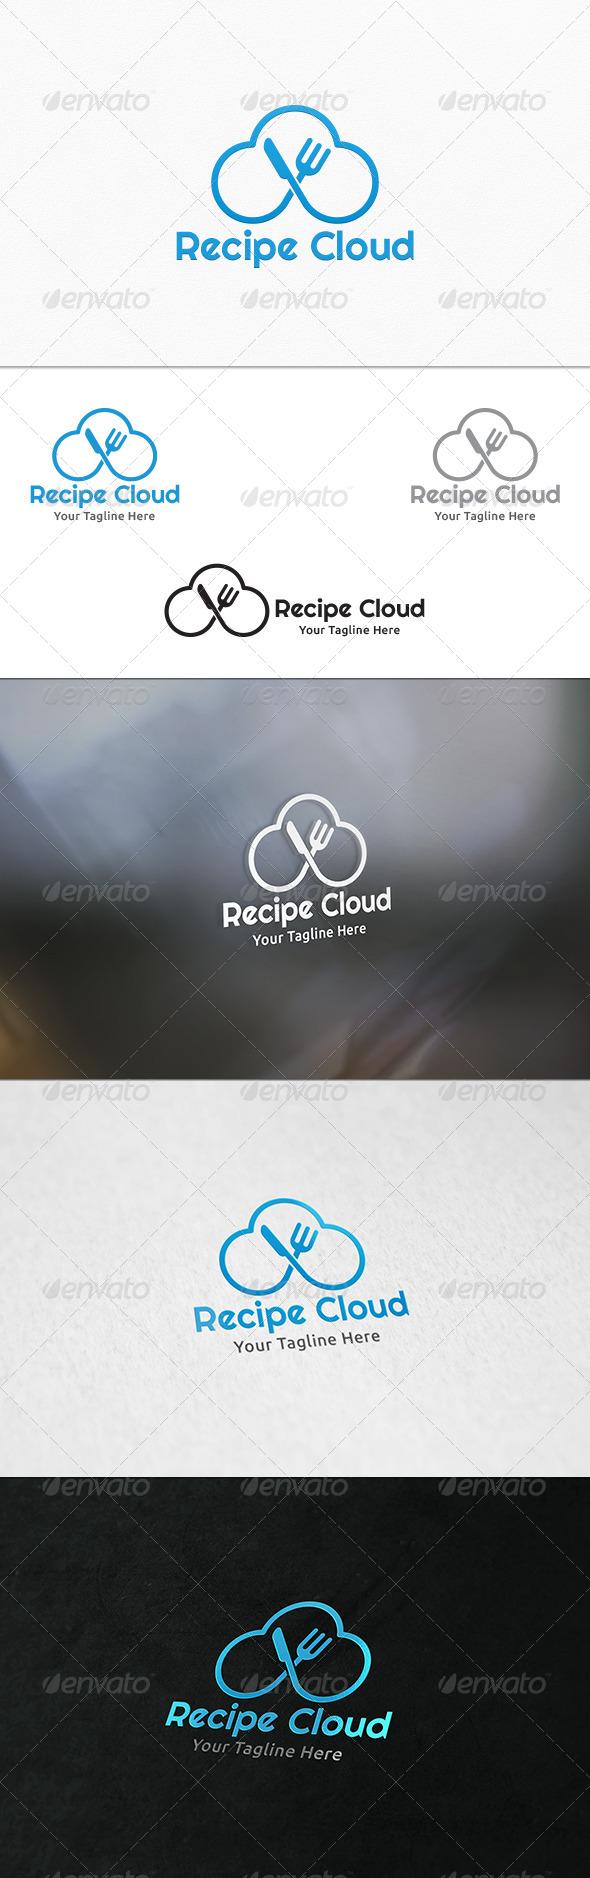 GraphicRiver Recipe Cloud Logo Template 7959786